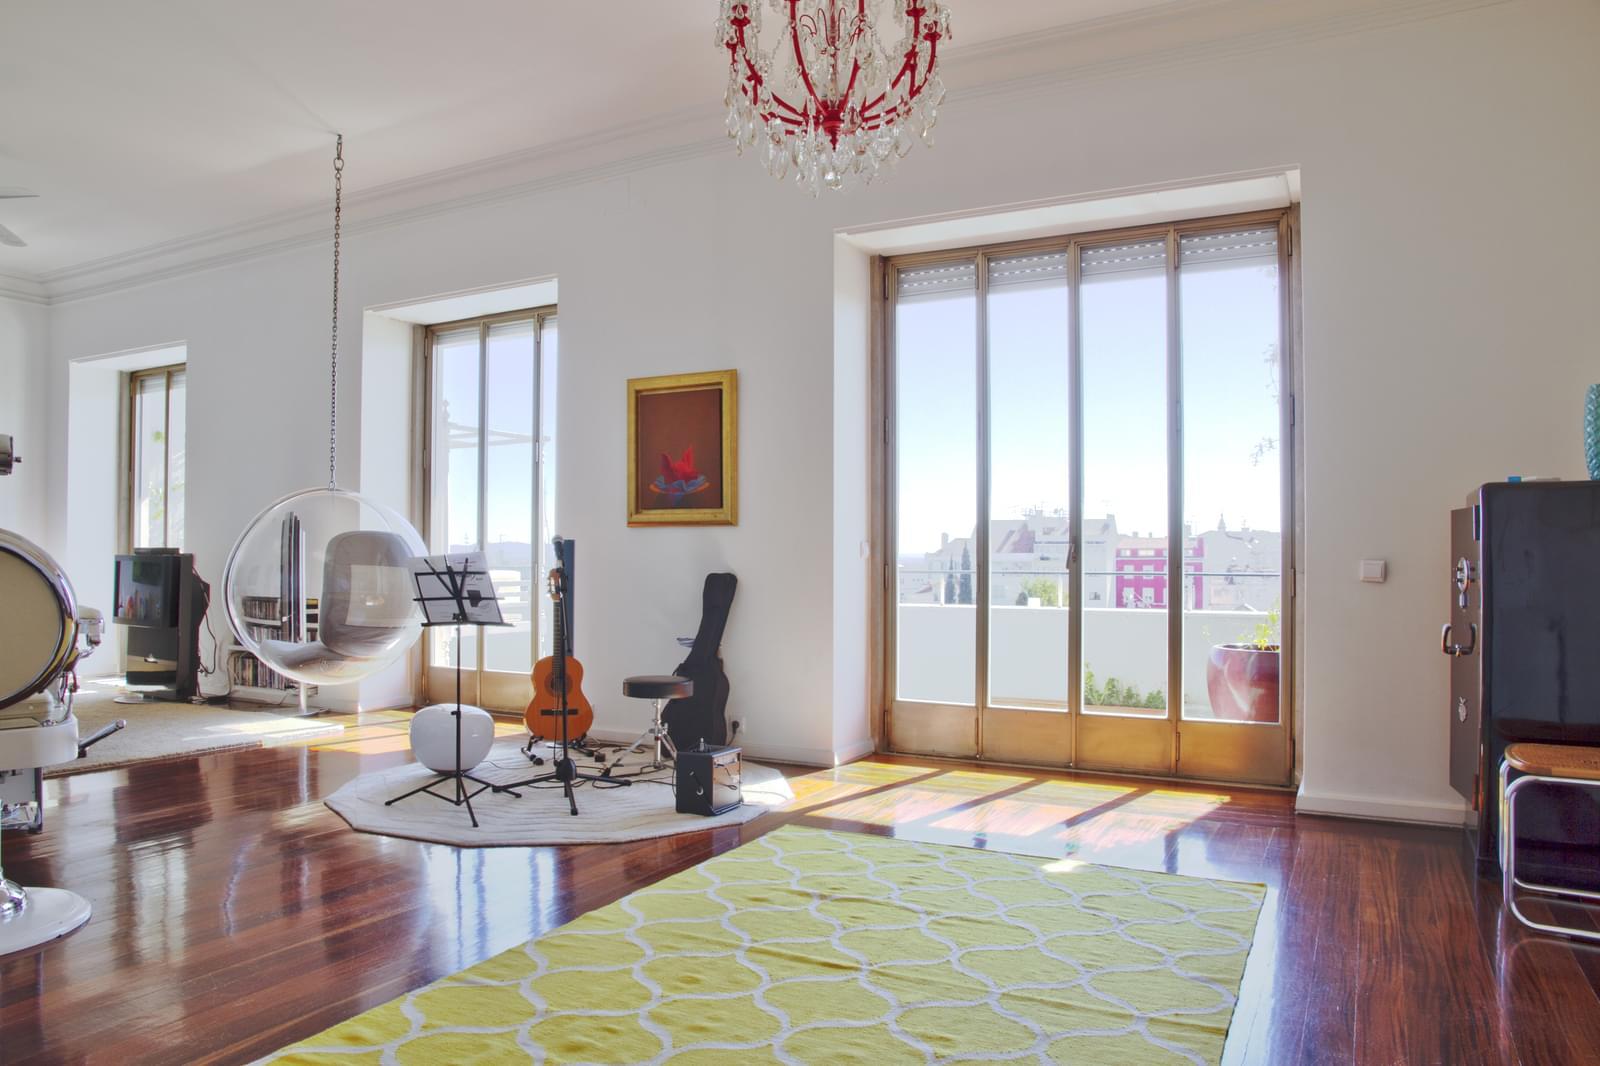 pf18175-apartamento-t5-lisboa-2db3be5a-8fe8-47b6-9b68-062983096ca7